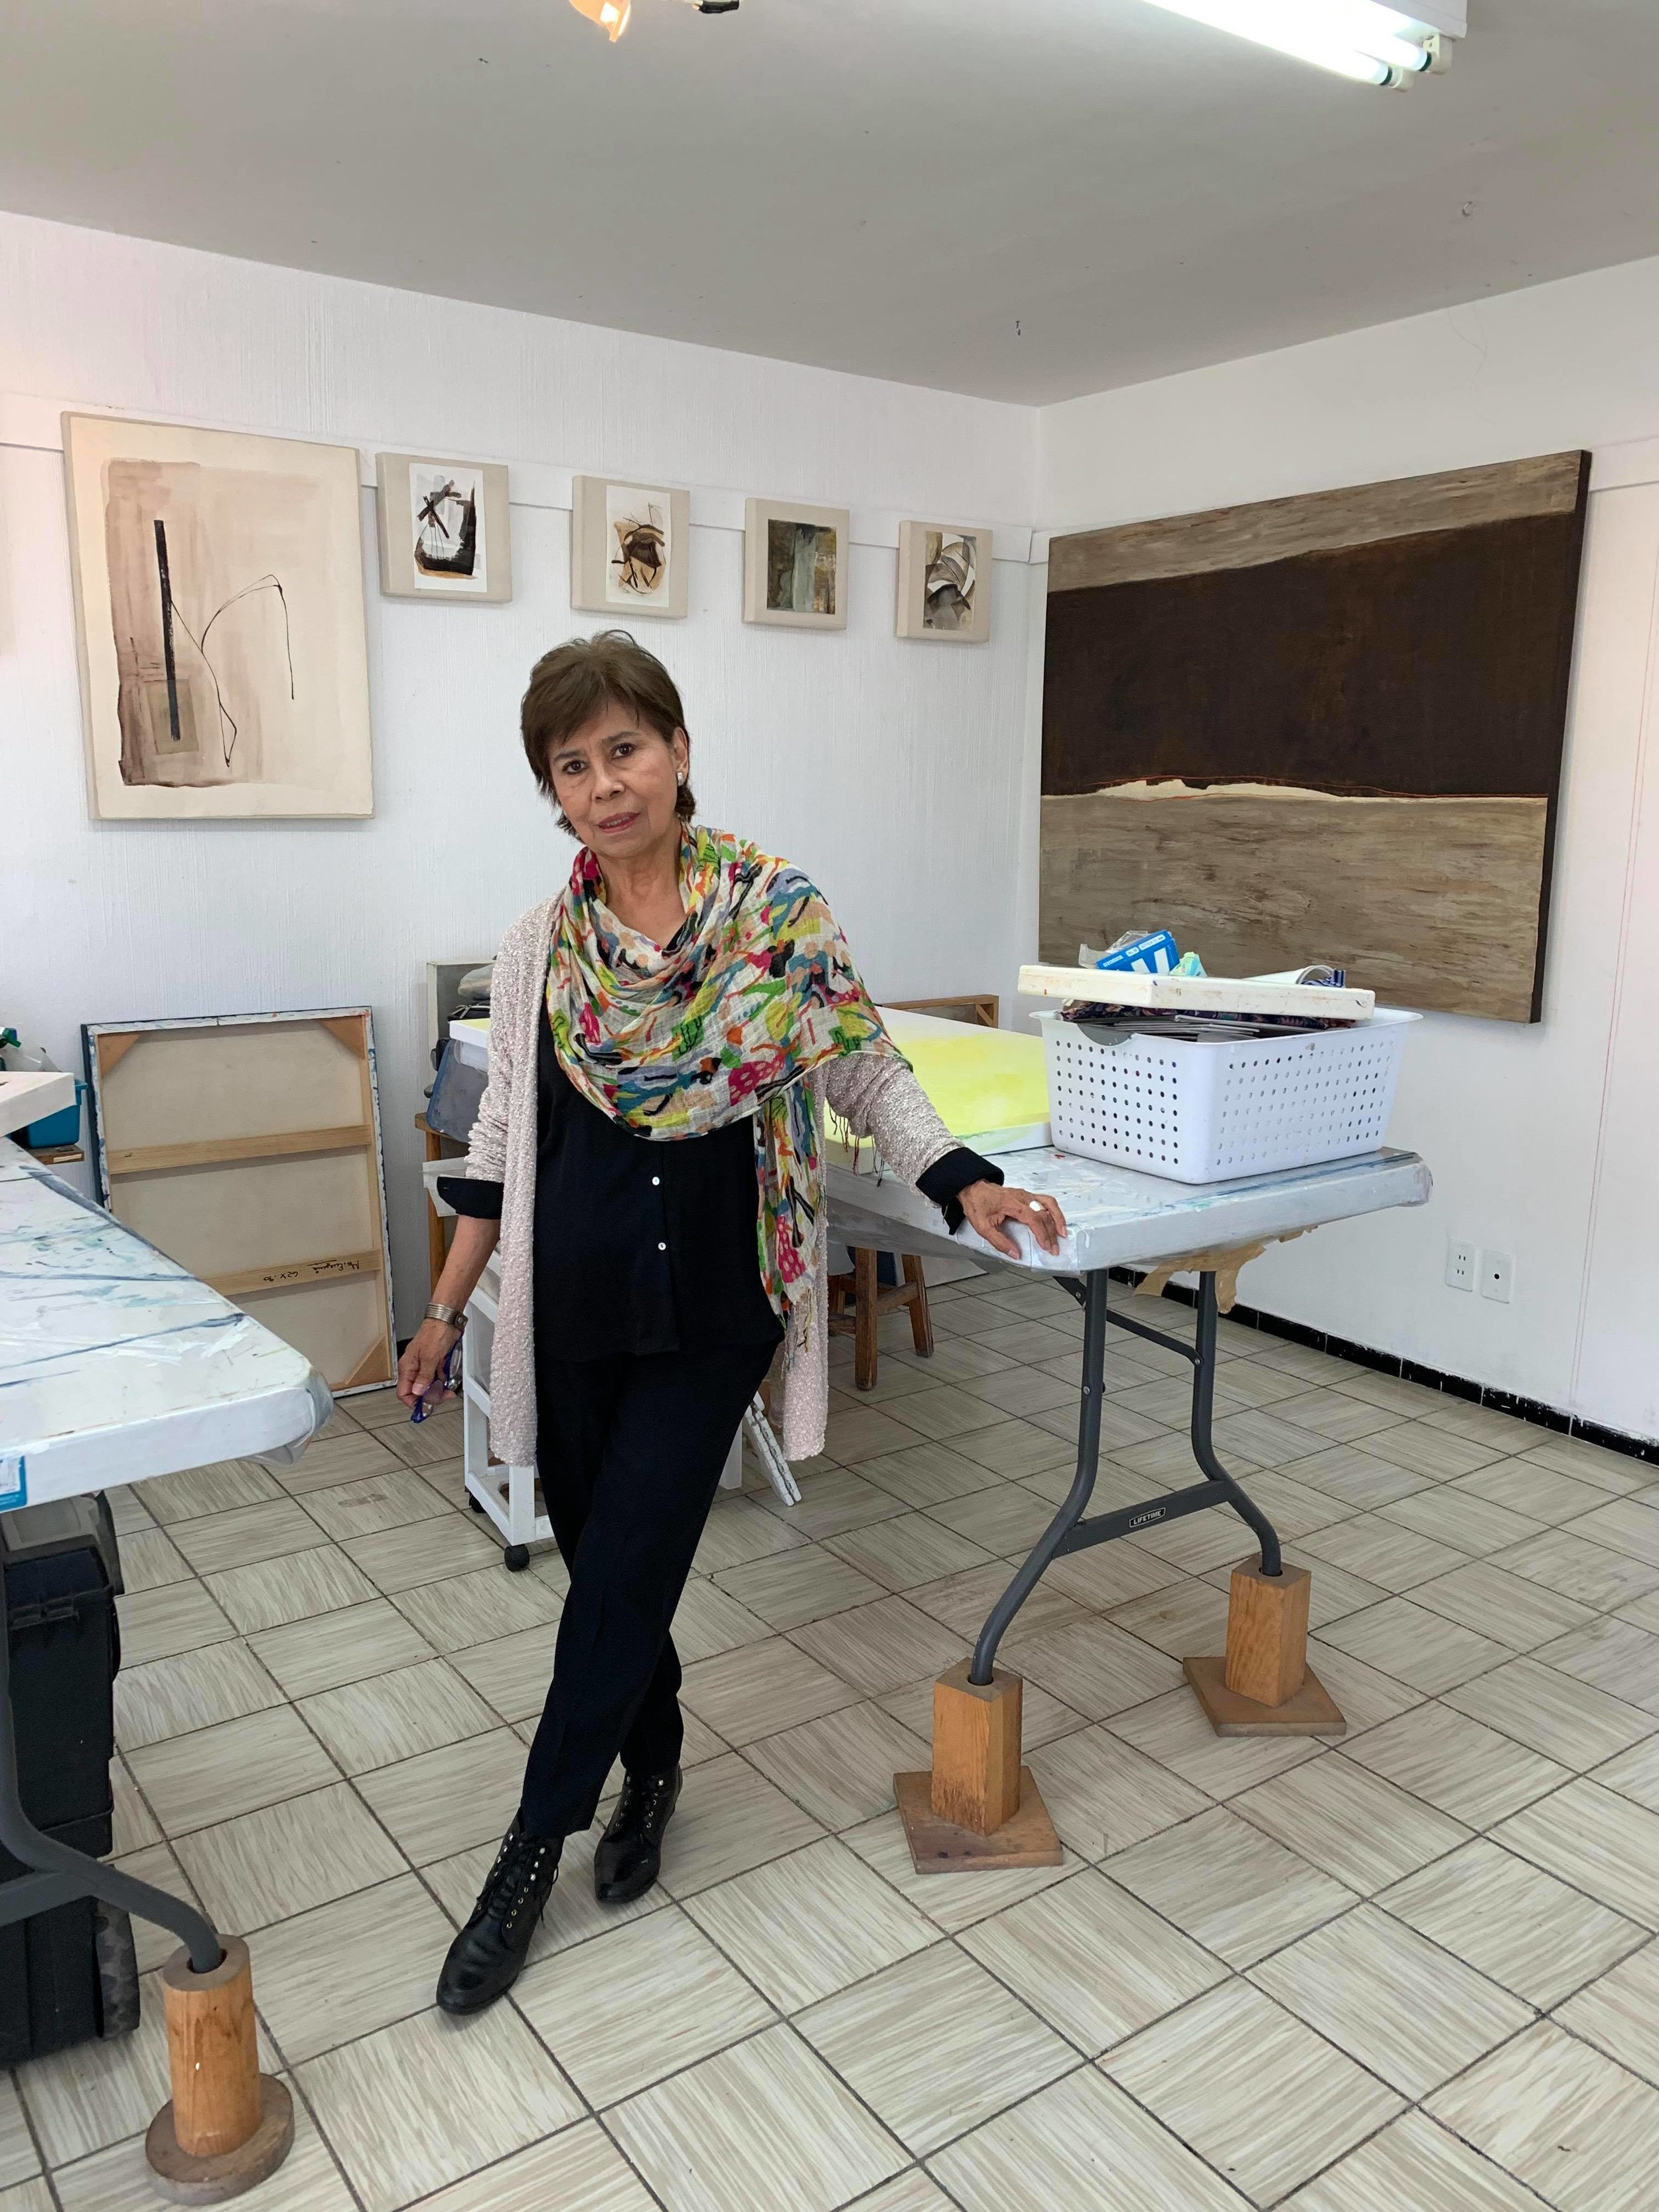 Consuelo Velazquez